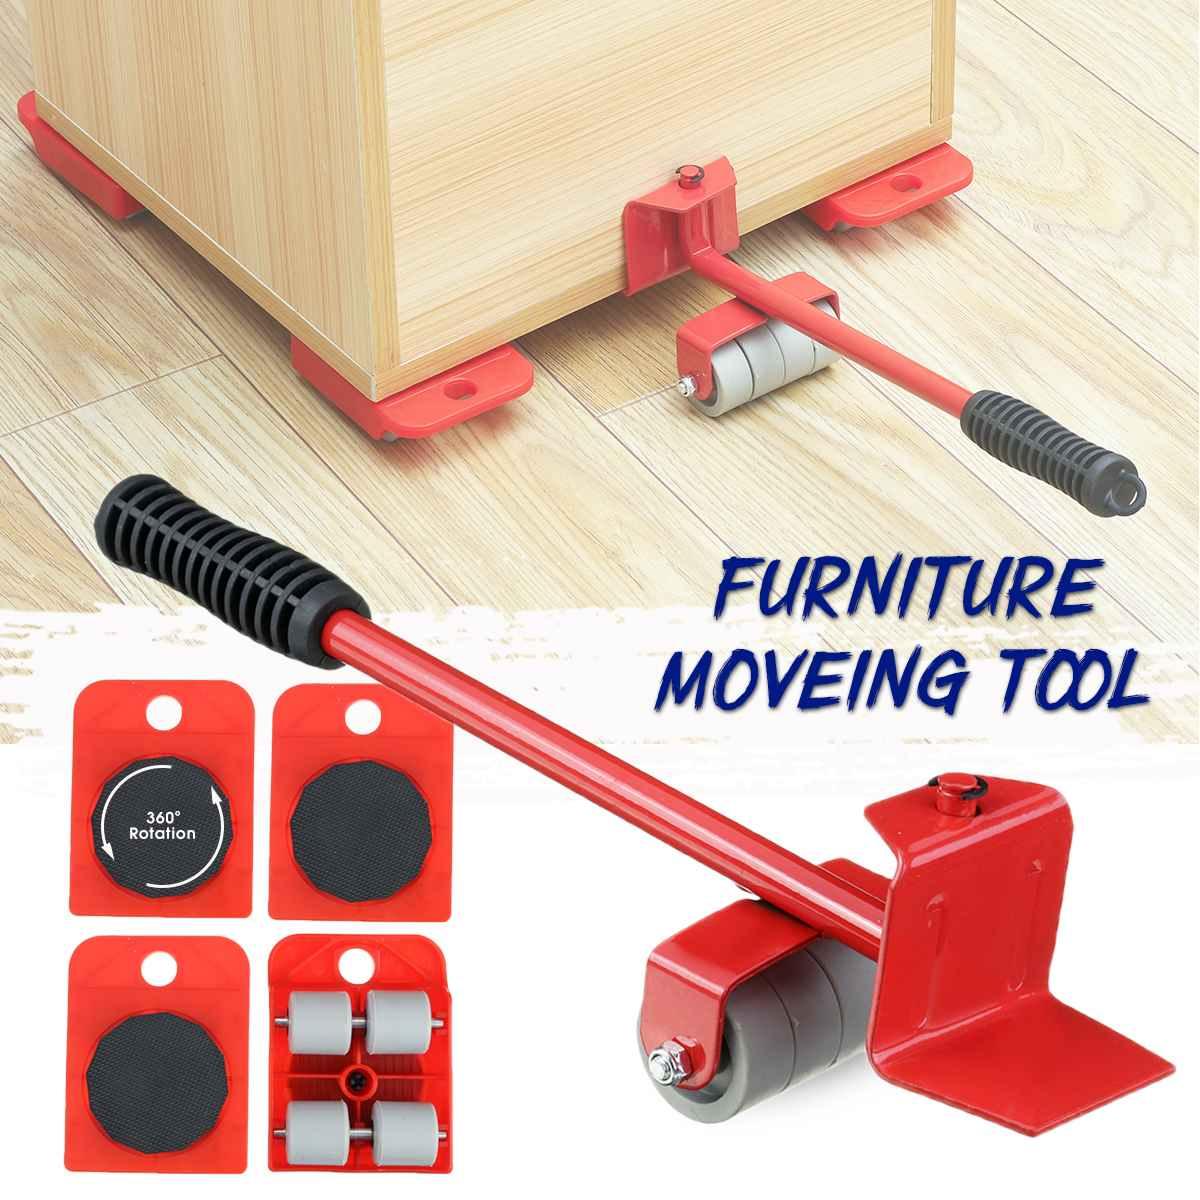 5Pcs Furniture Lifter Mover Furniture Moving Transport Set Heavy Hand Tool Set Mover Roller + Wheel Bar